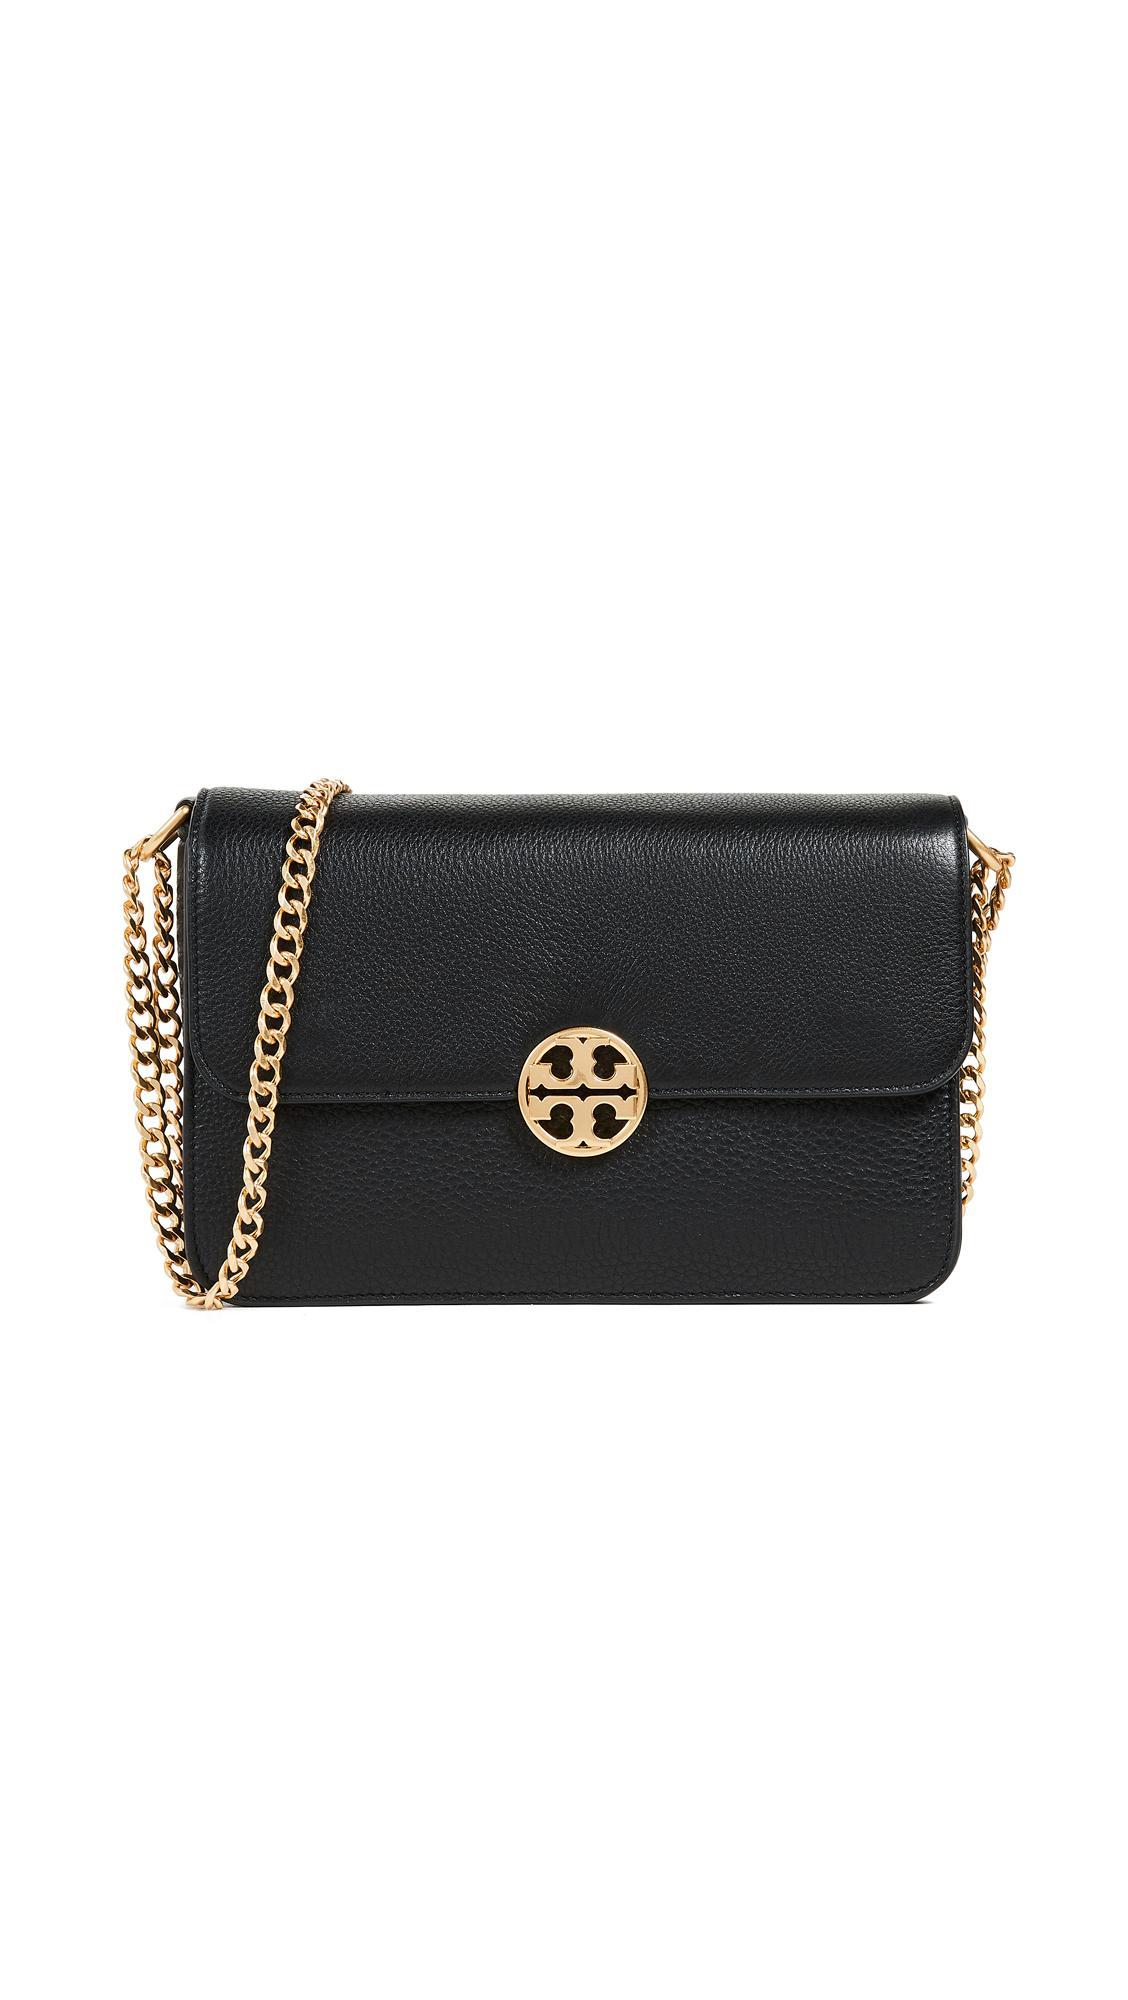 bc82baa99e0e Tory Burch Chelsea Shoulder Bag In Black | ModeSens